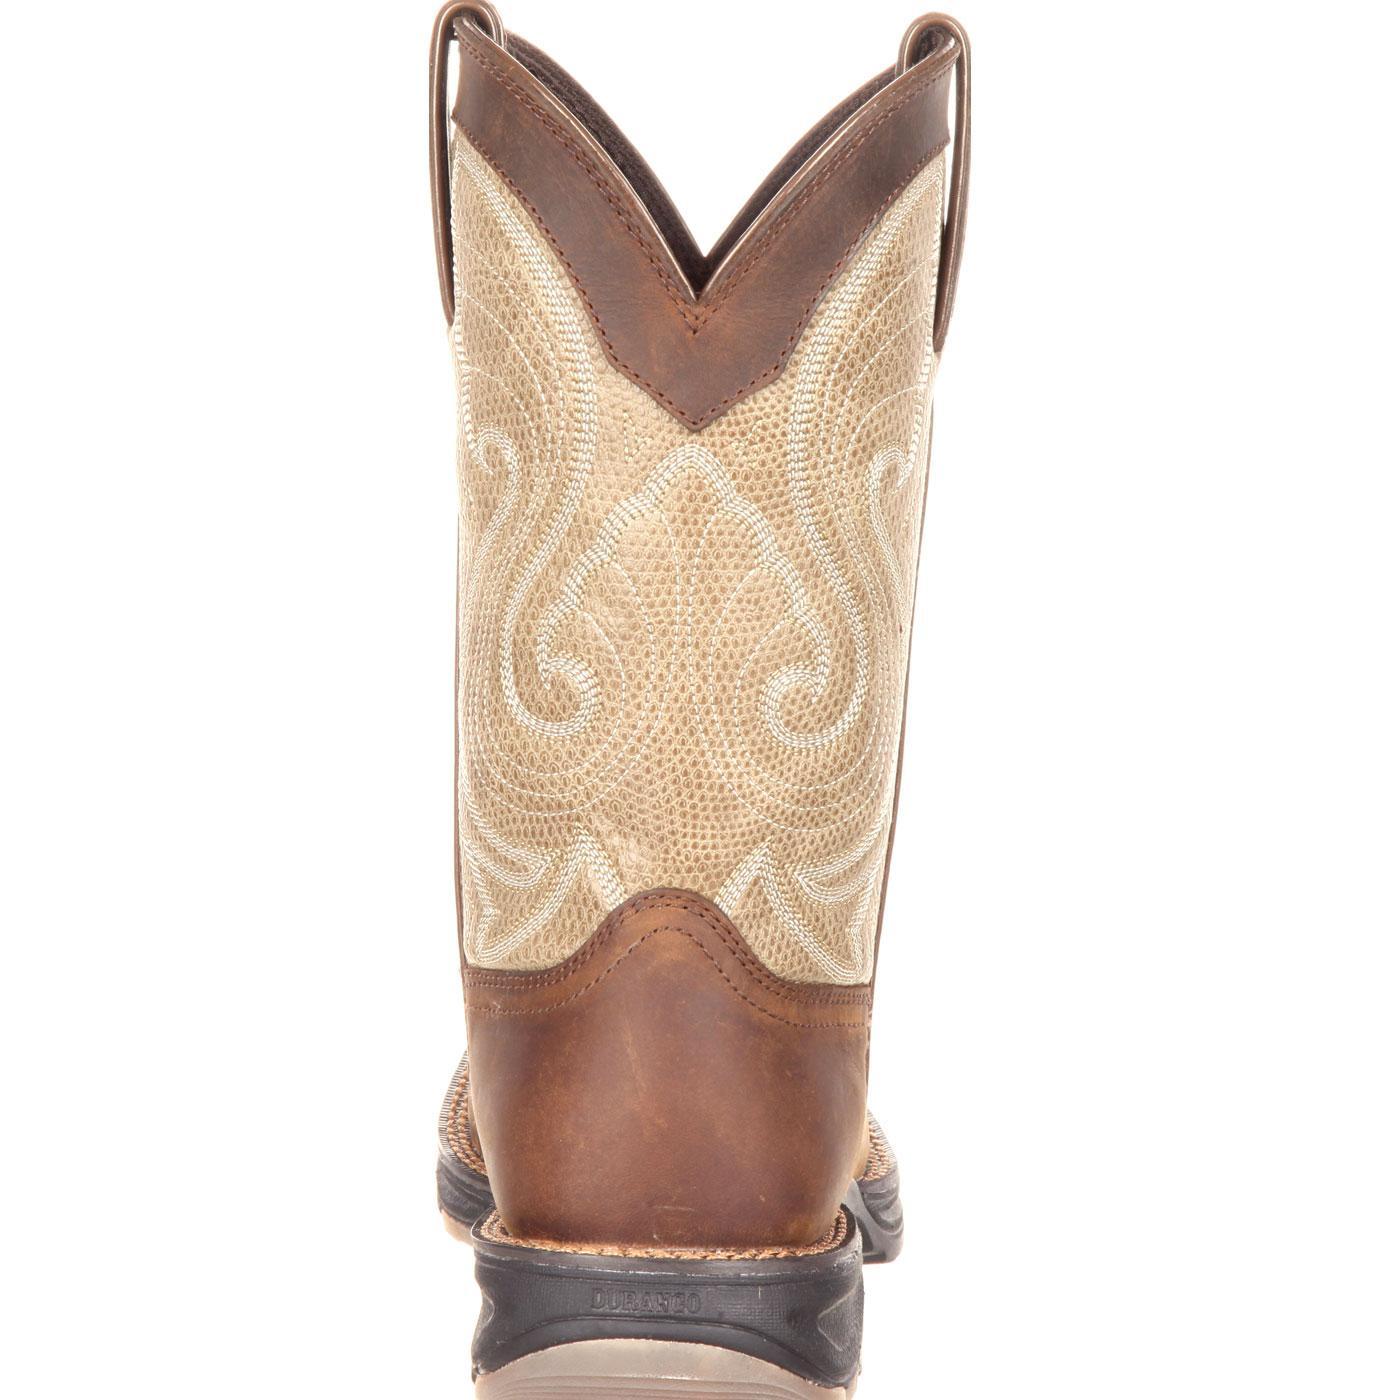 474293a68 Durango UltraLite Women's Western Boot, #DRD0182